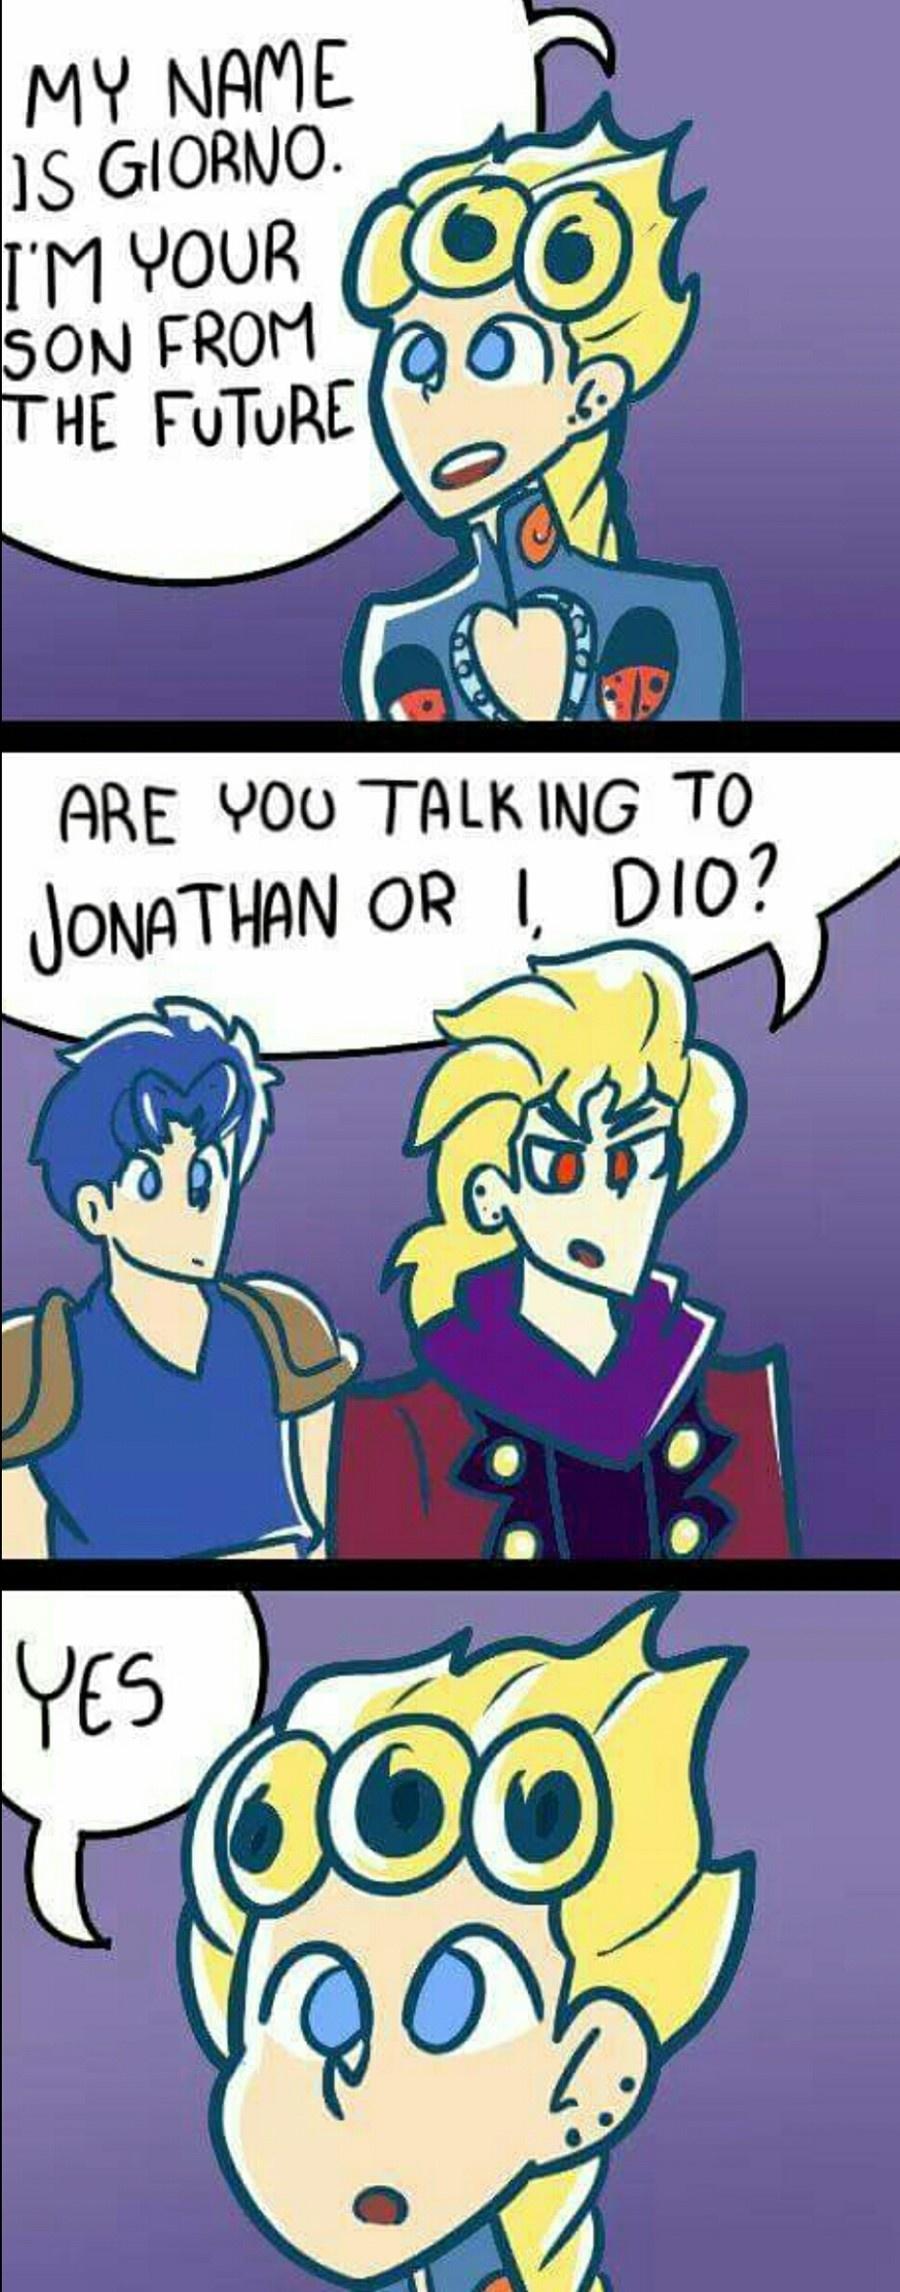 "Giorno meeting dio and jonathan  """